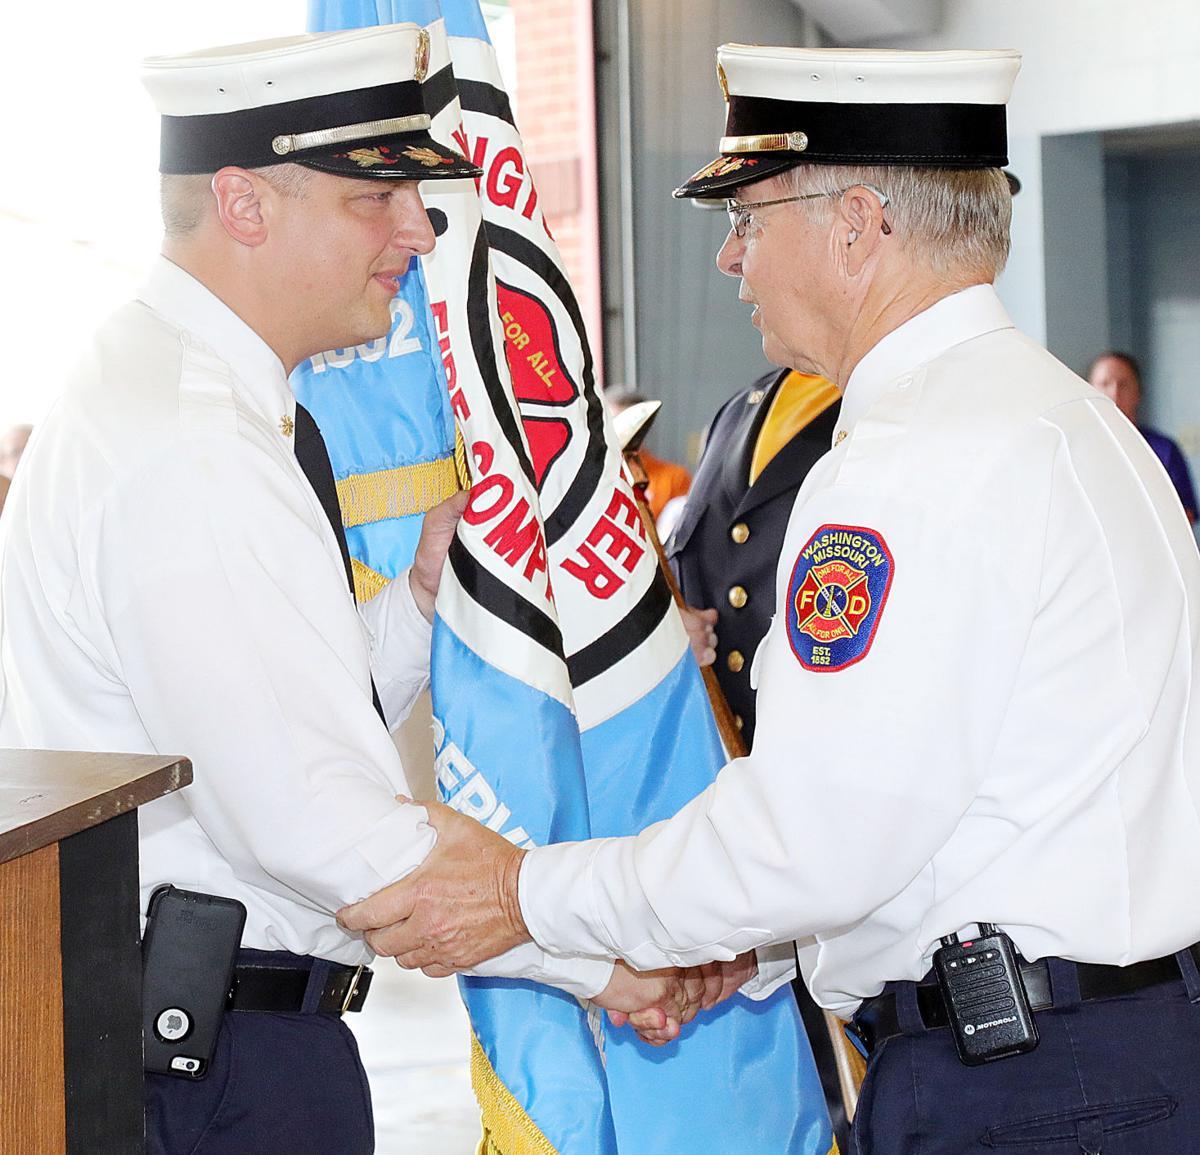 Frankenberg Fire Chief